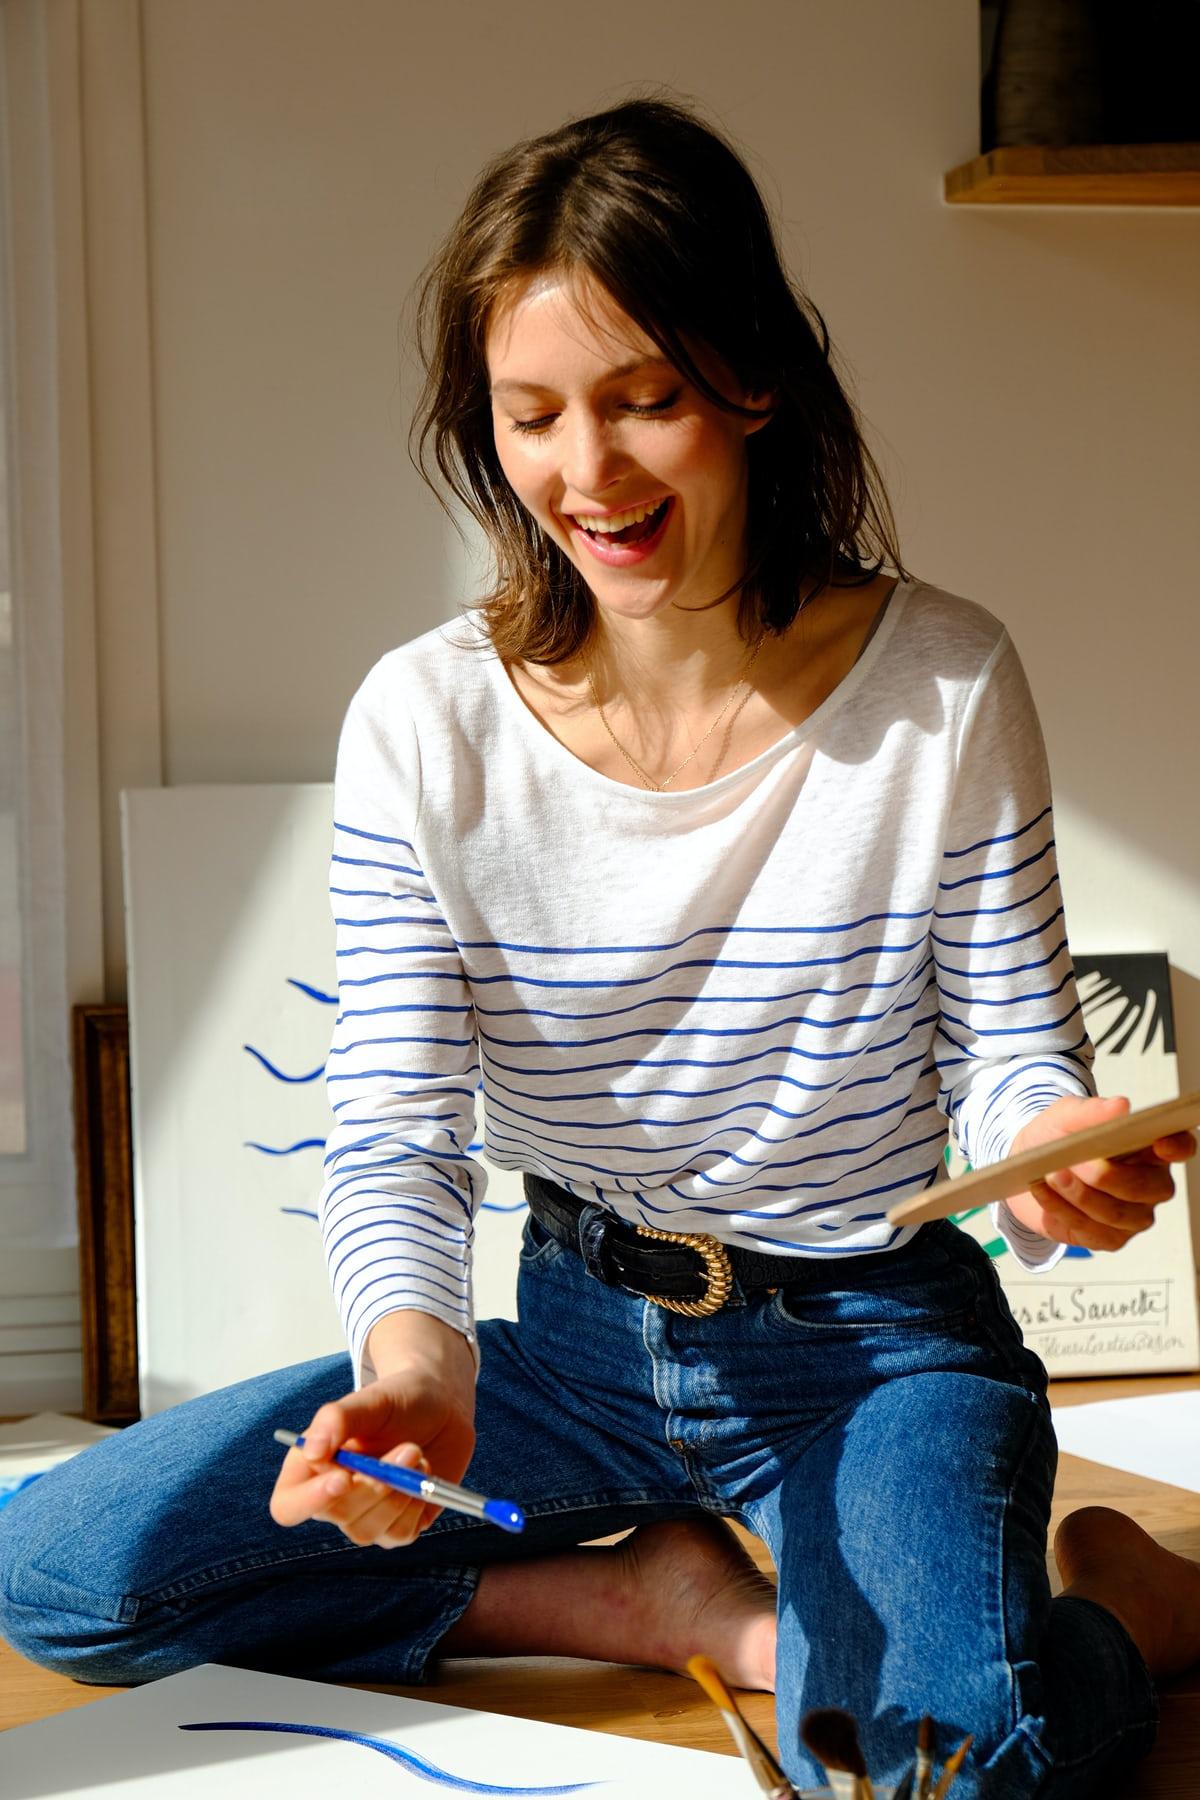 Woman having fun while painting.